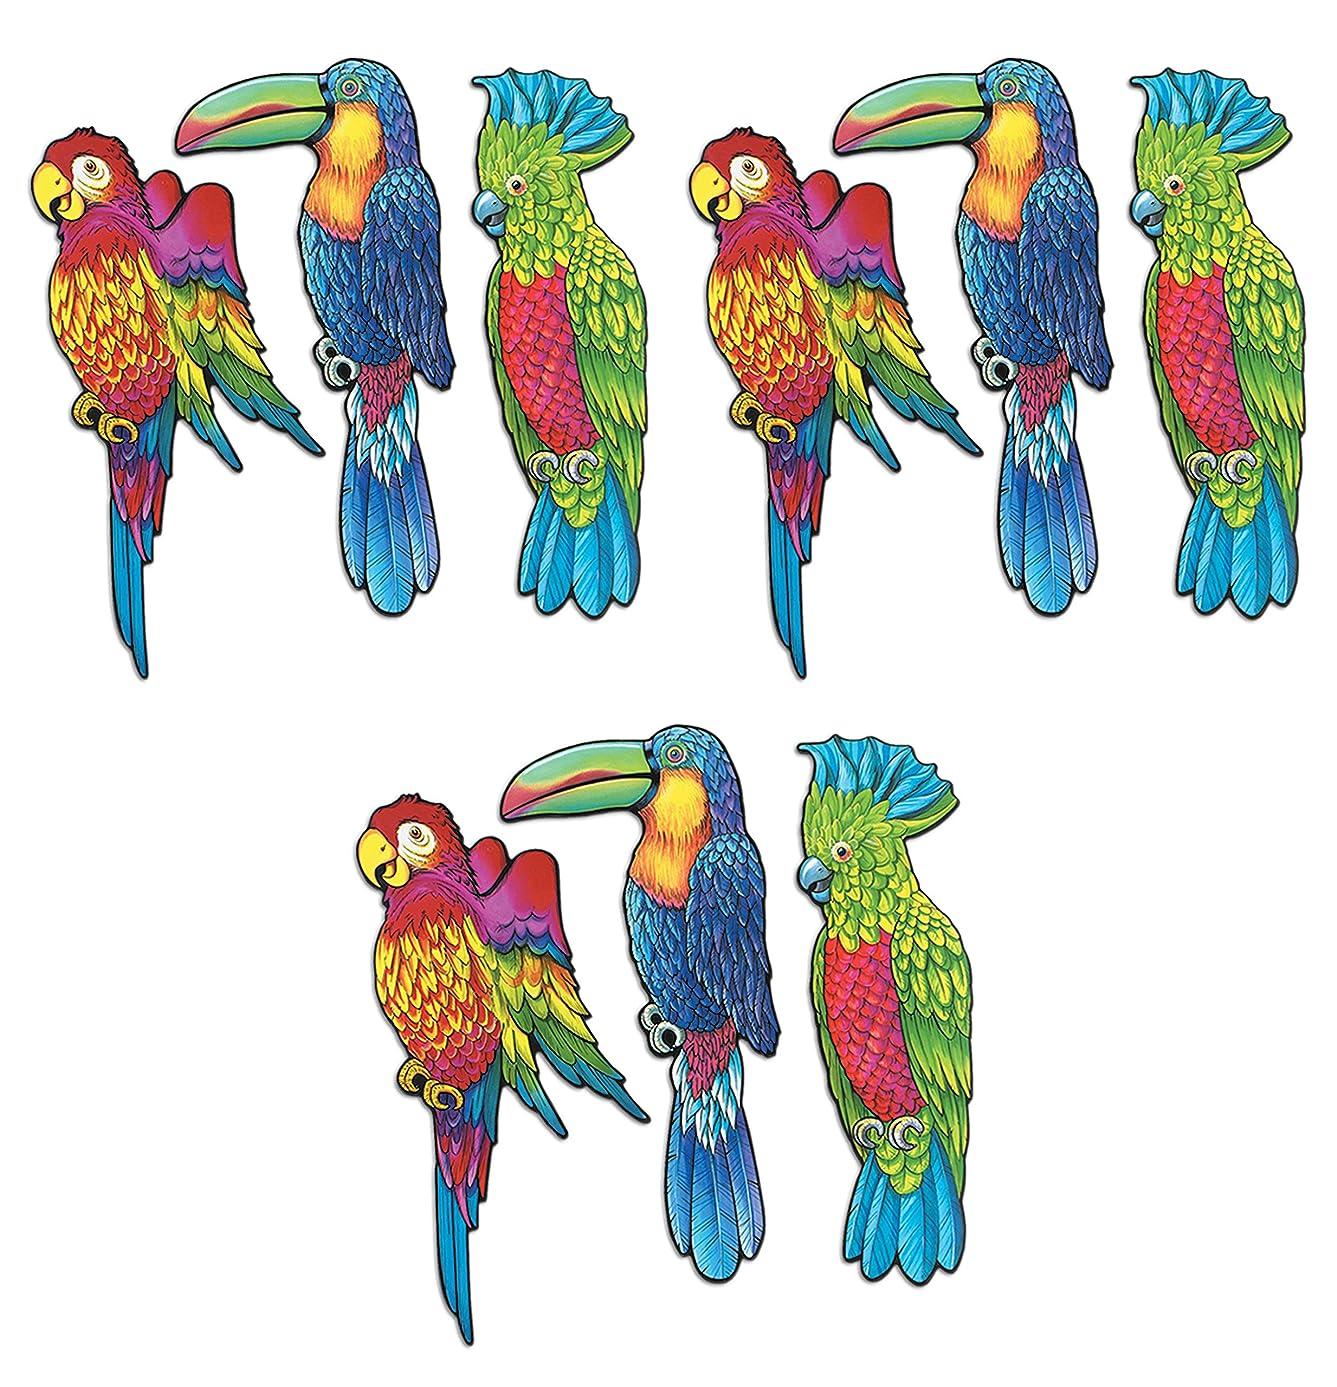 Beistle S55926AZ3, 9 Piece Exotic Bird Cutouts, 17